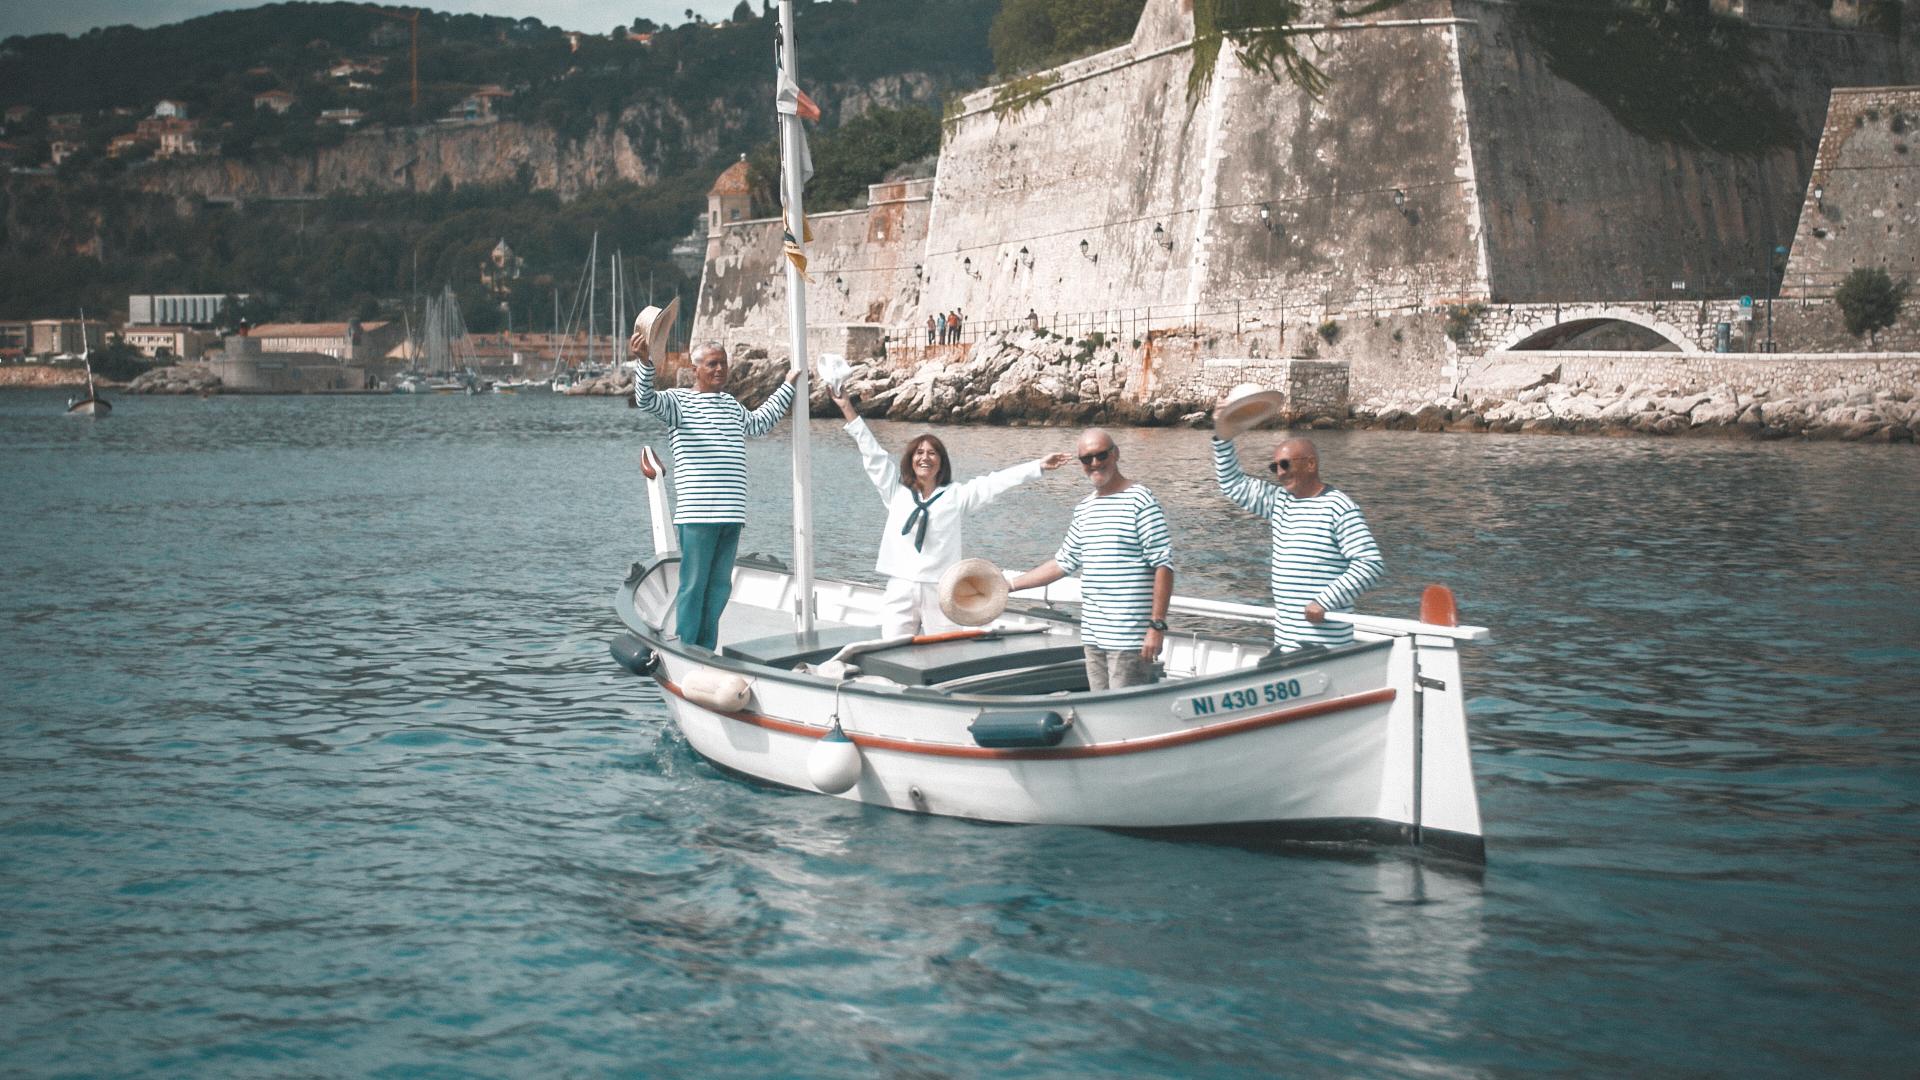 25 Juin – Journée Internationale des Gens de Mer